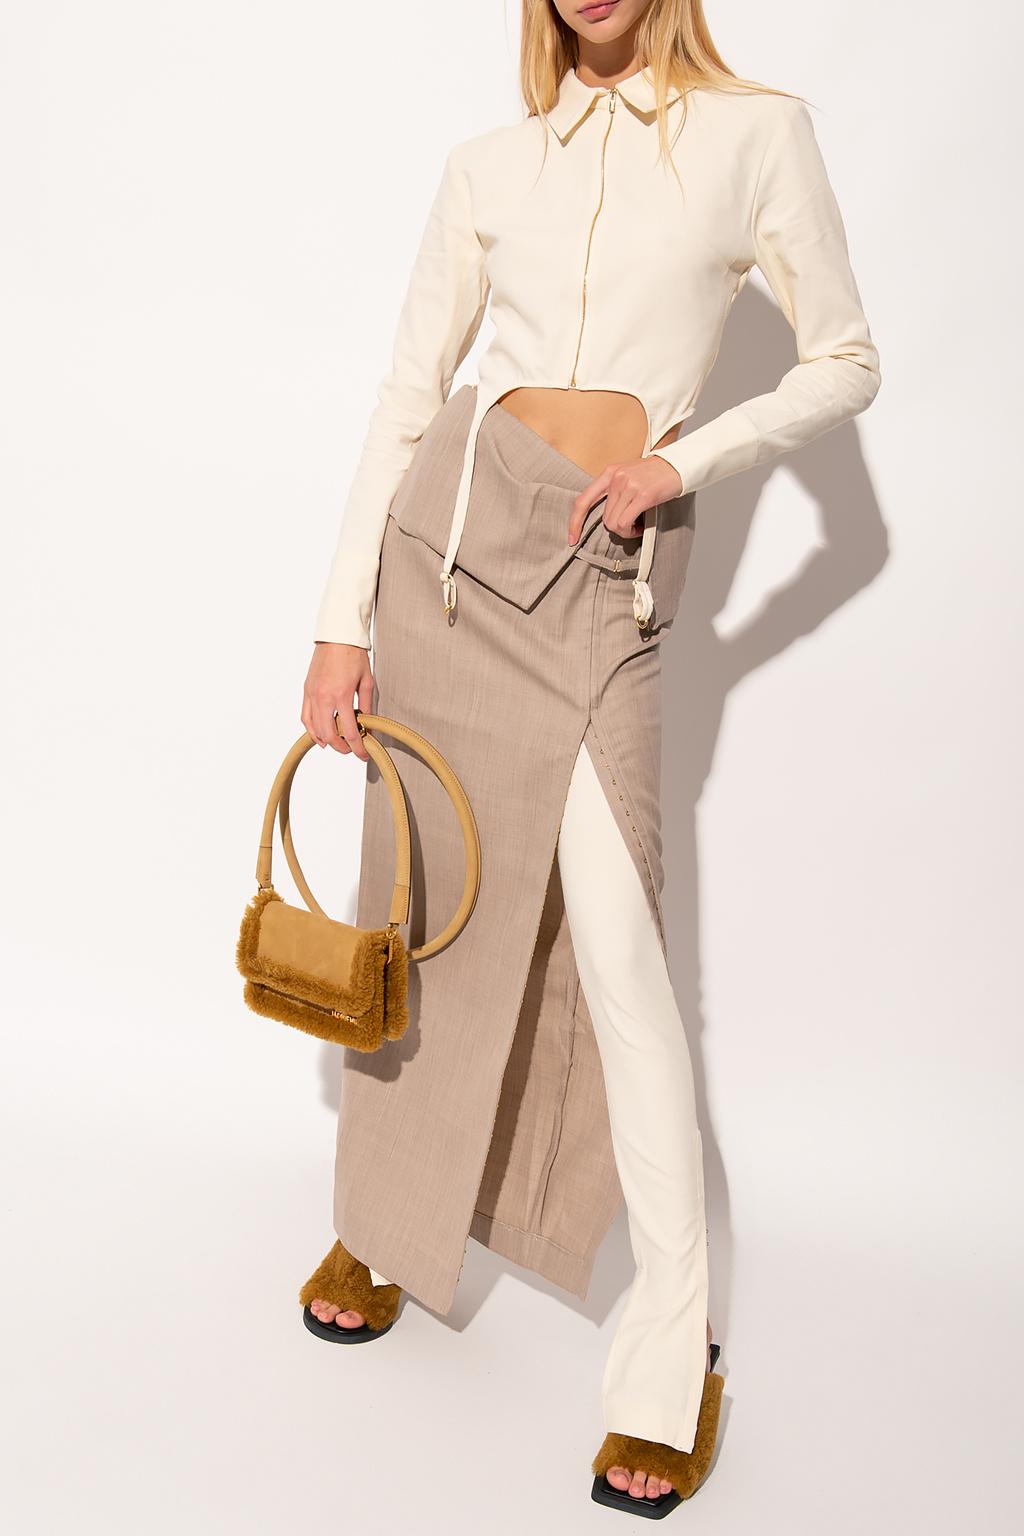 Jacquemus Wool skirt